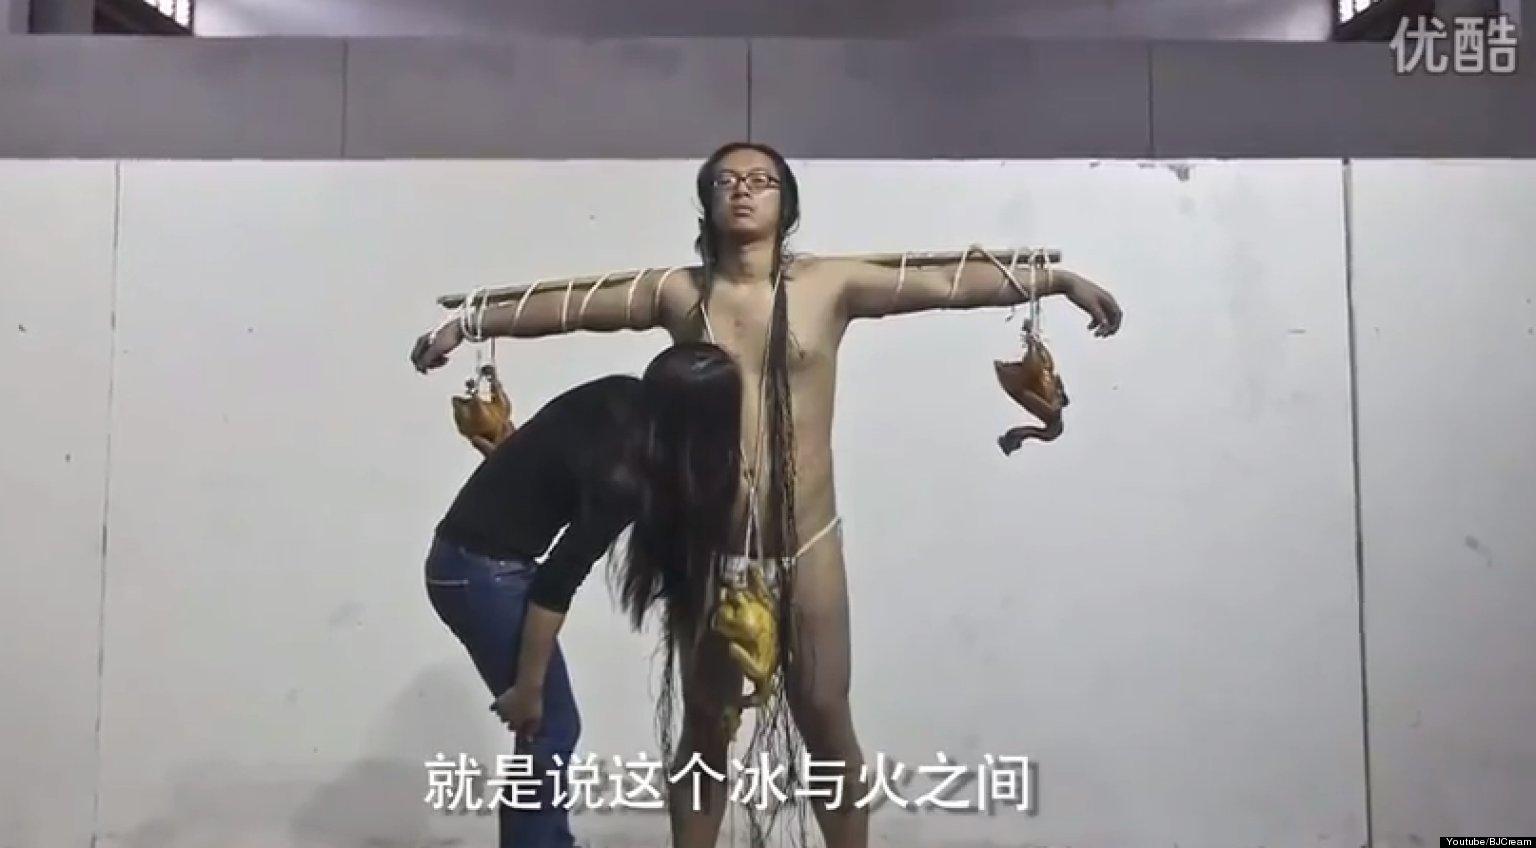 Chinese Artist Kang Yi Receives Hickeys As Performance Art